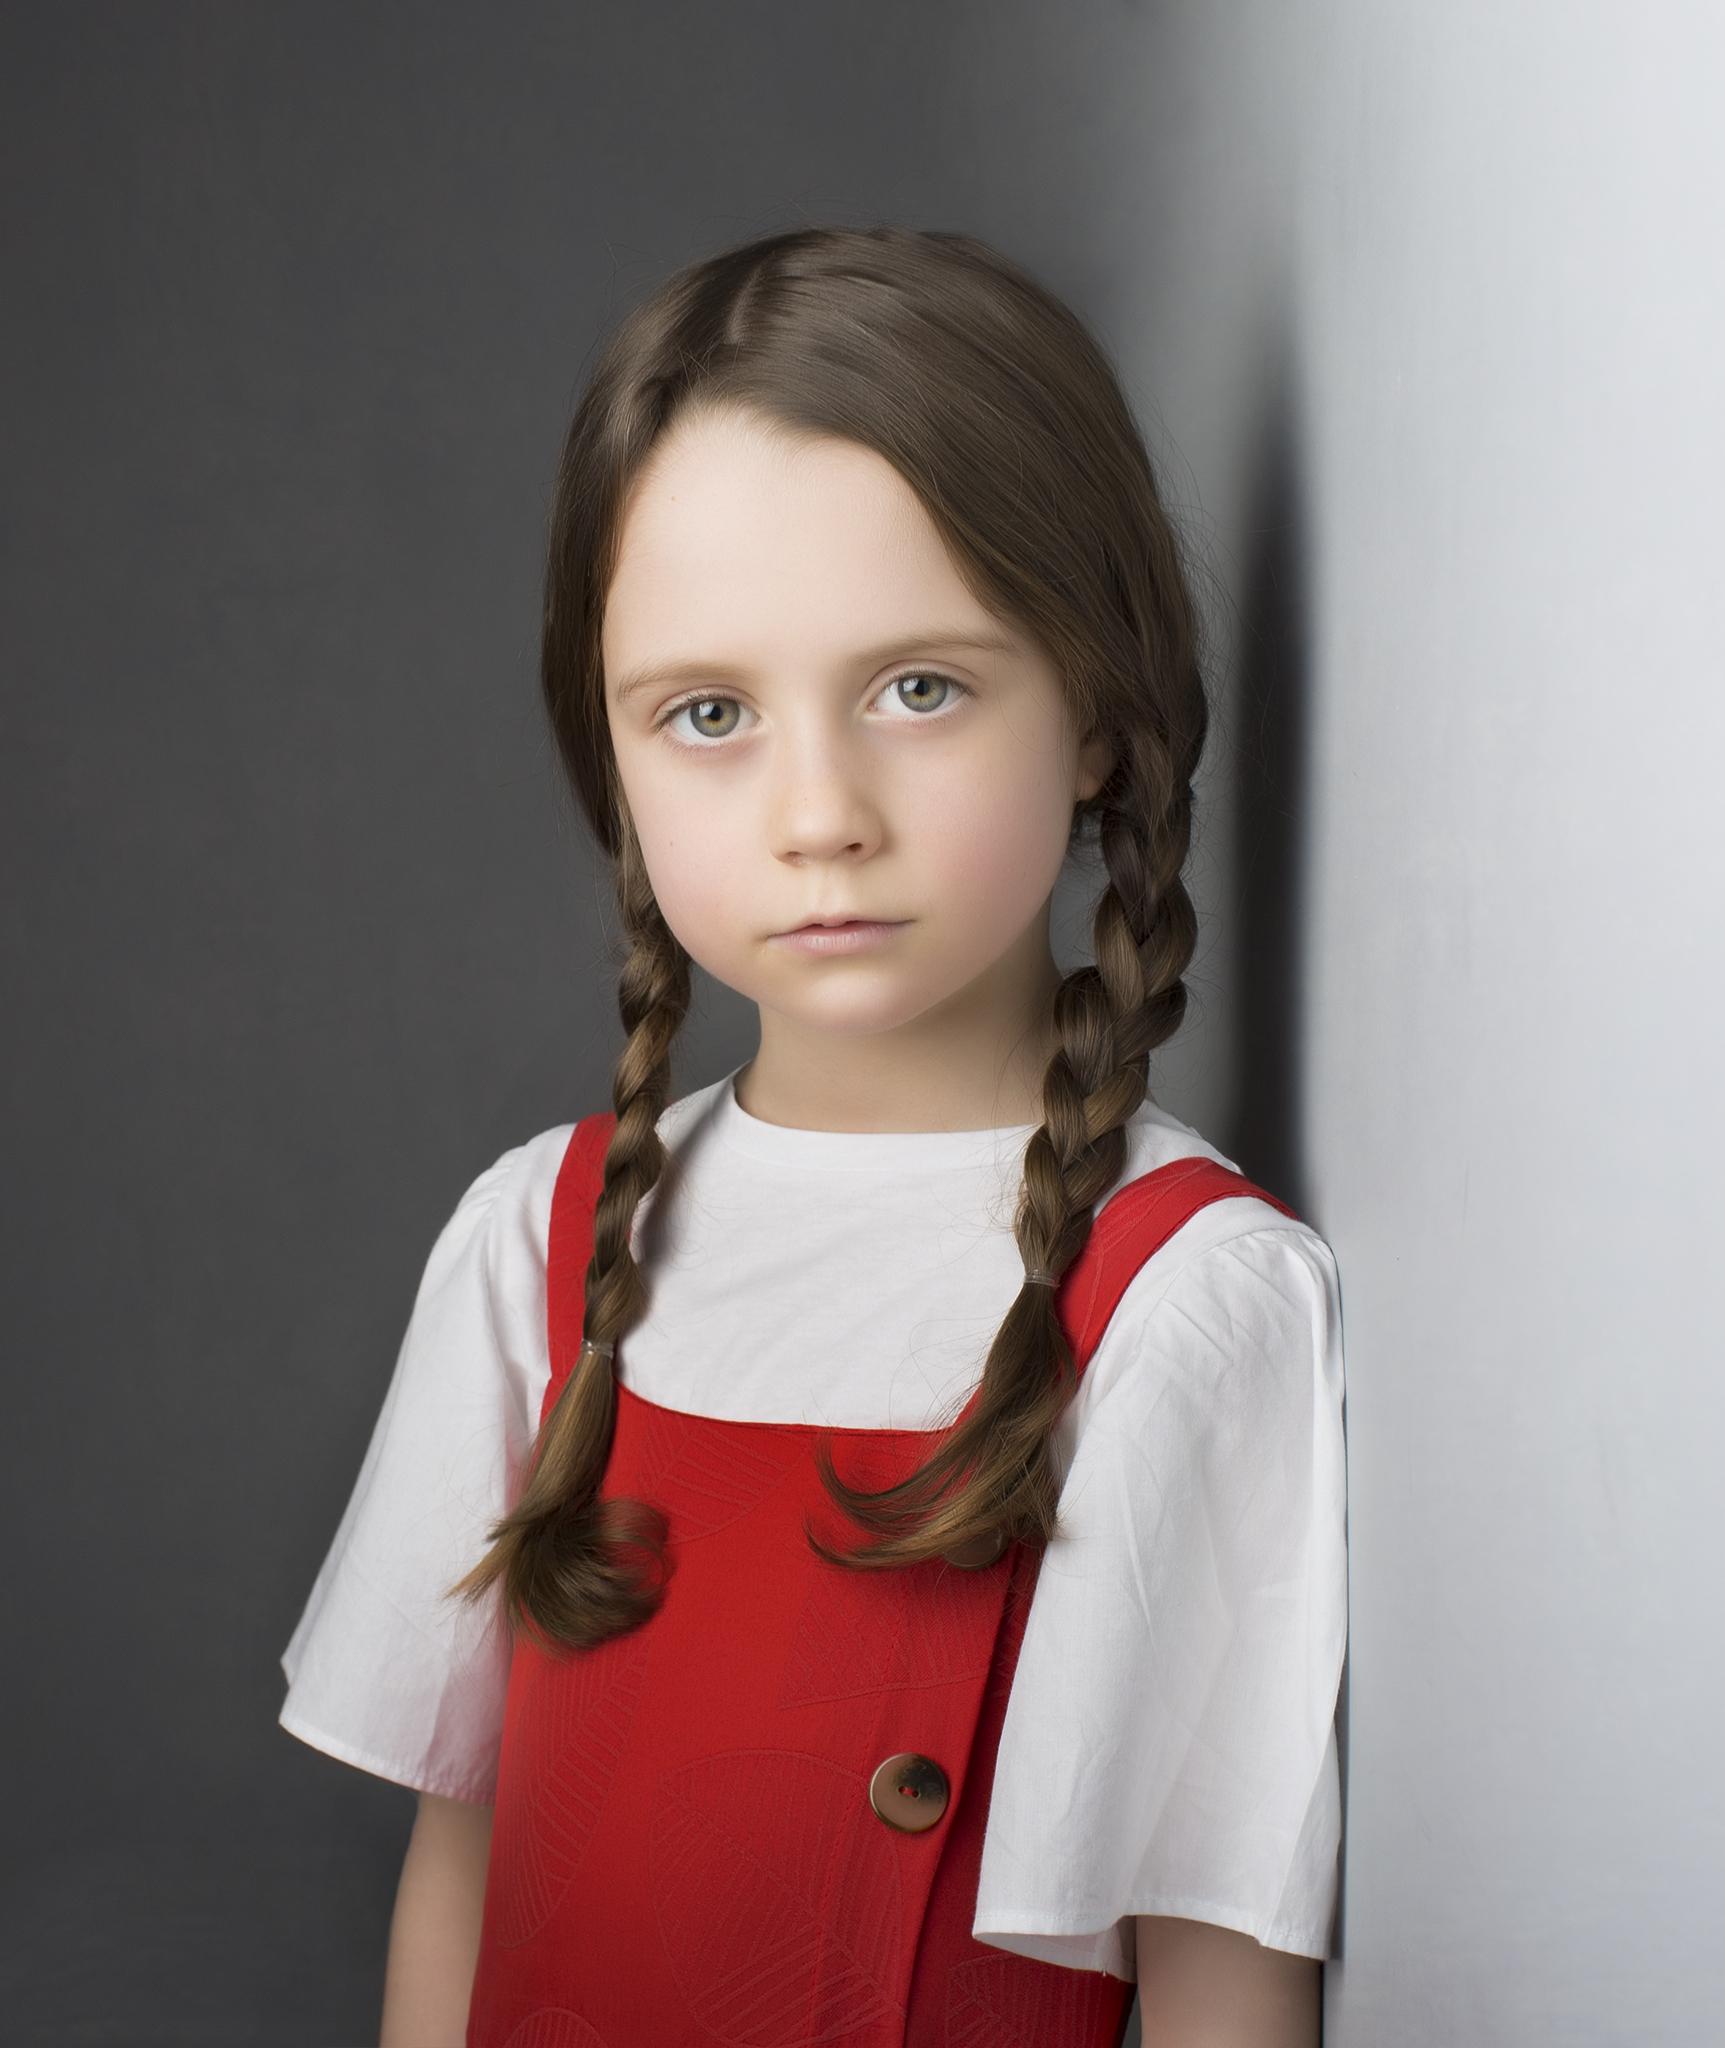 elizabethgphotography_fineart_kingslangley_hertfordshire_child_model_alana_tinyangels_03.jpg